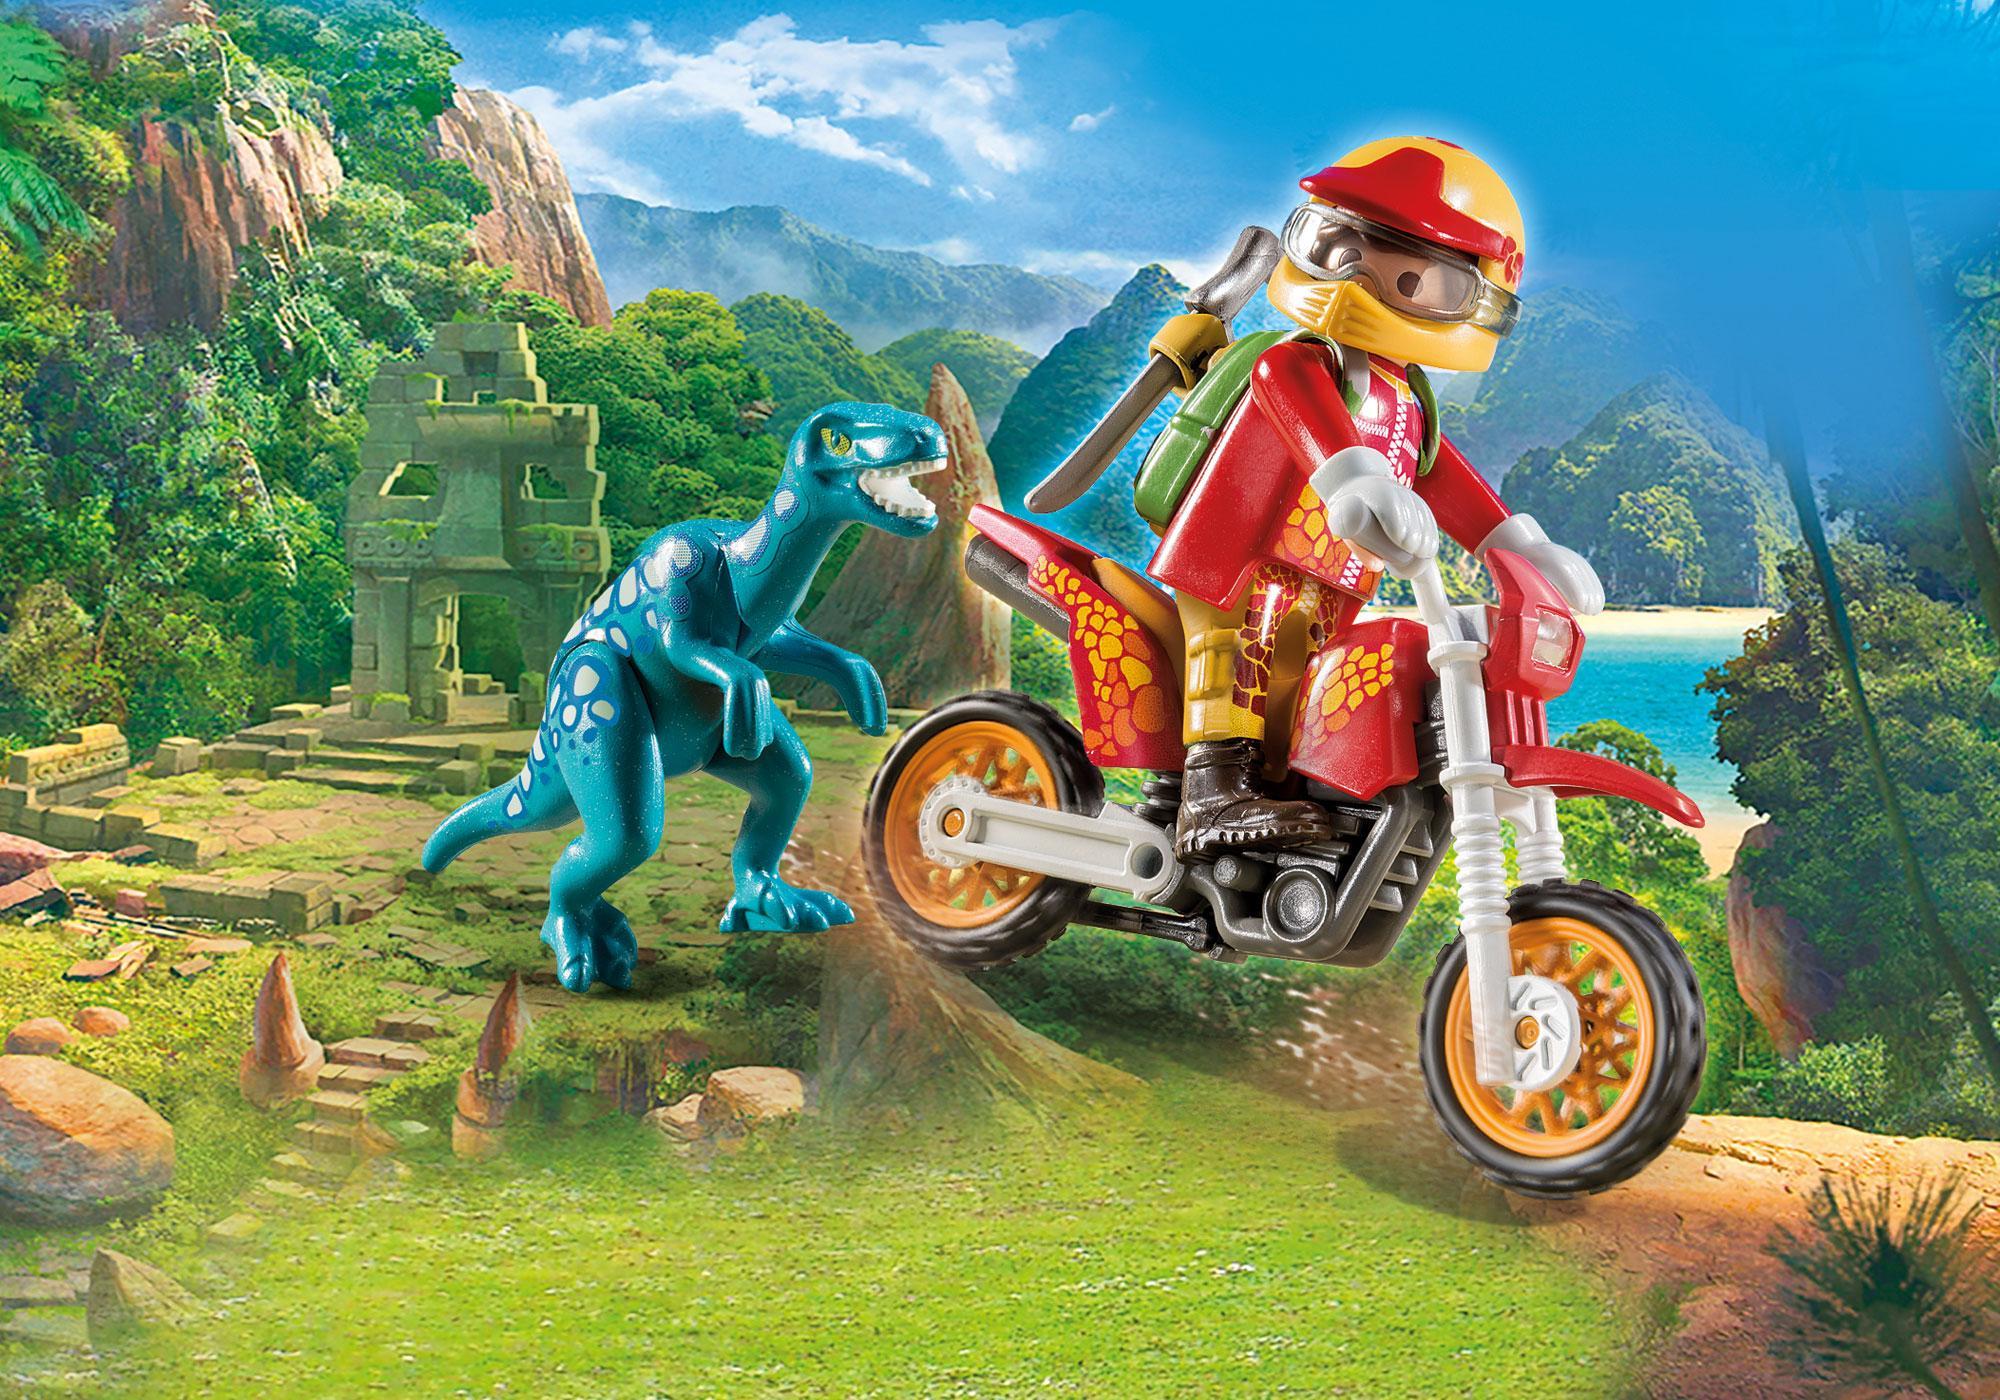 9431_product_detail/Motocrosscykel med raptor